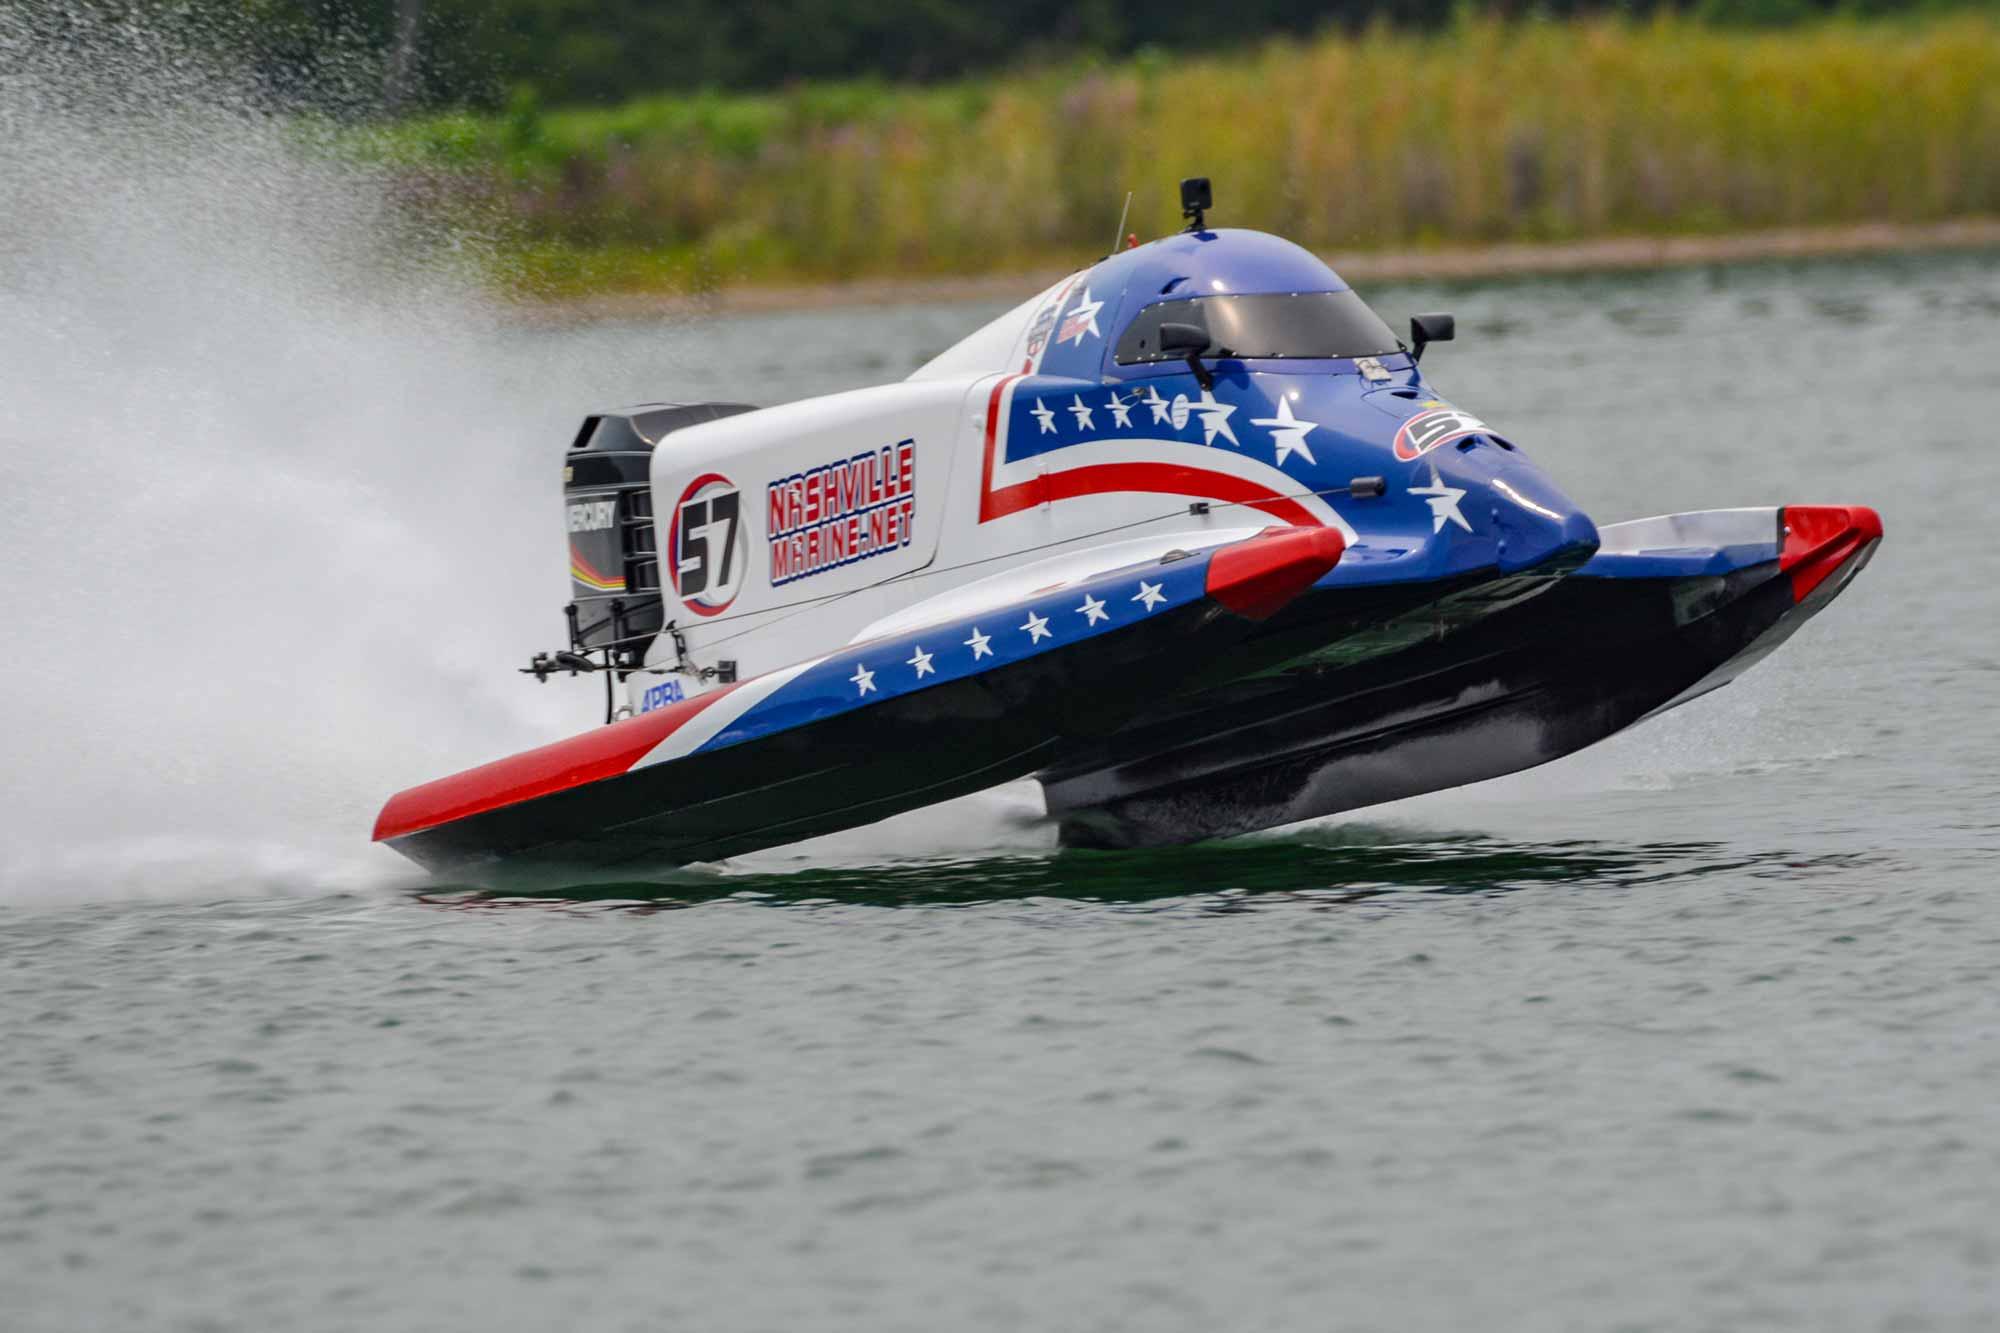 McMurray-Racing-Nashvill-Marine-2021-Springfield-F1-Race-39